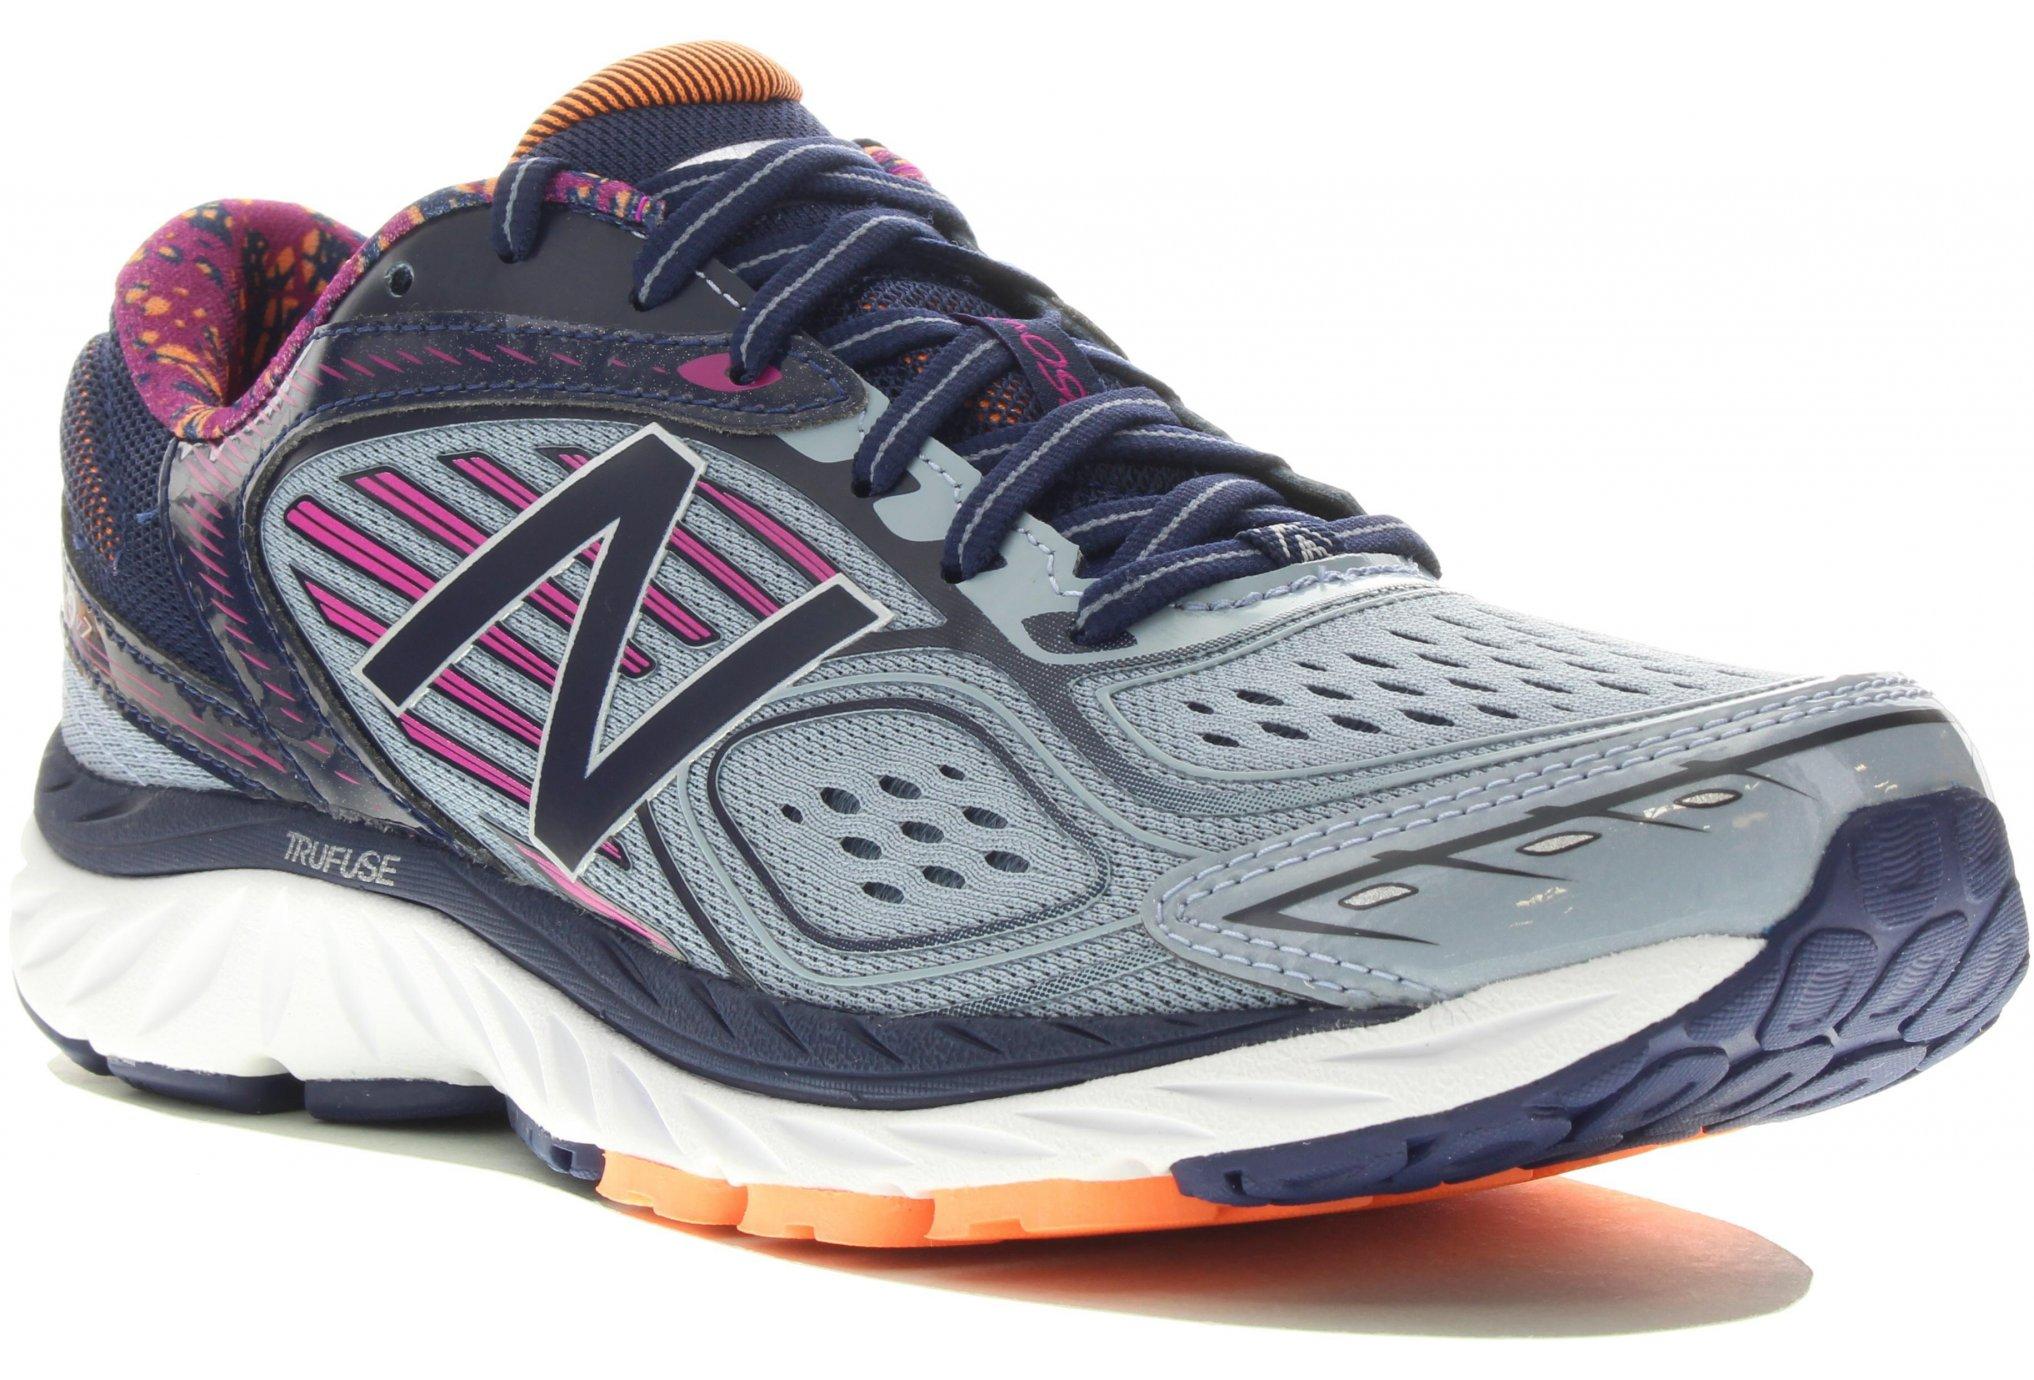 New Balance W 860 V7 - B Chaussures running femme